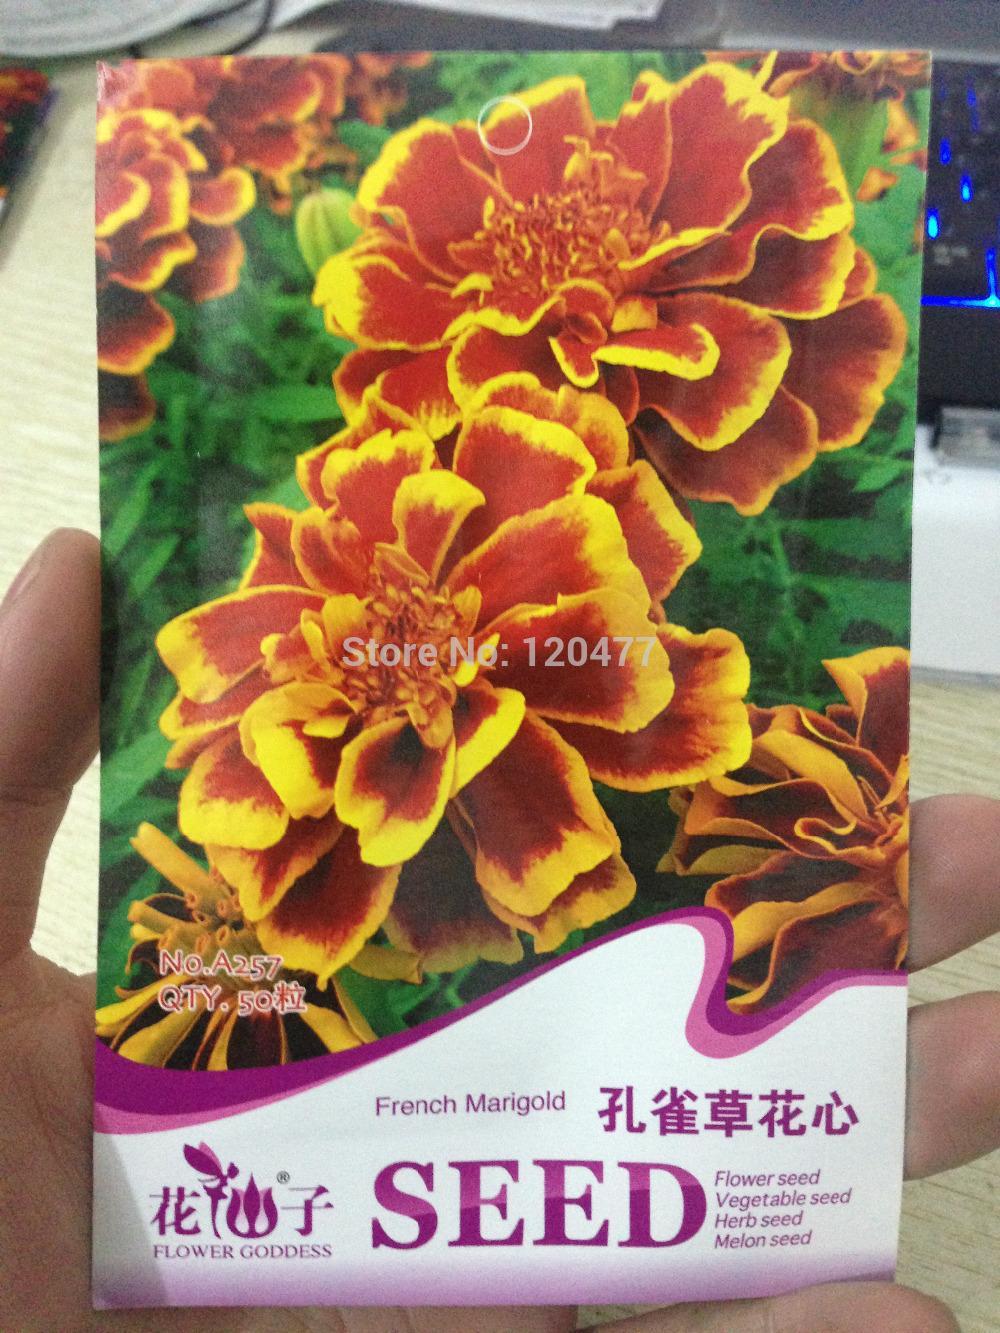 Maidenhair Mahogany seeds, french marigold seeds about 50 seeds/bag(China (Mainland))